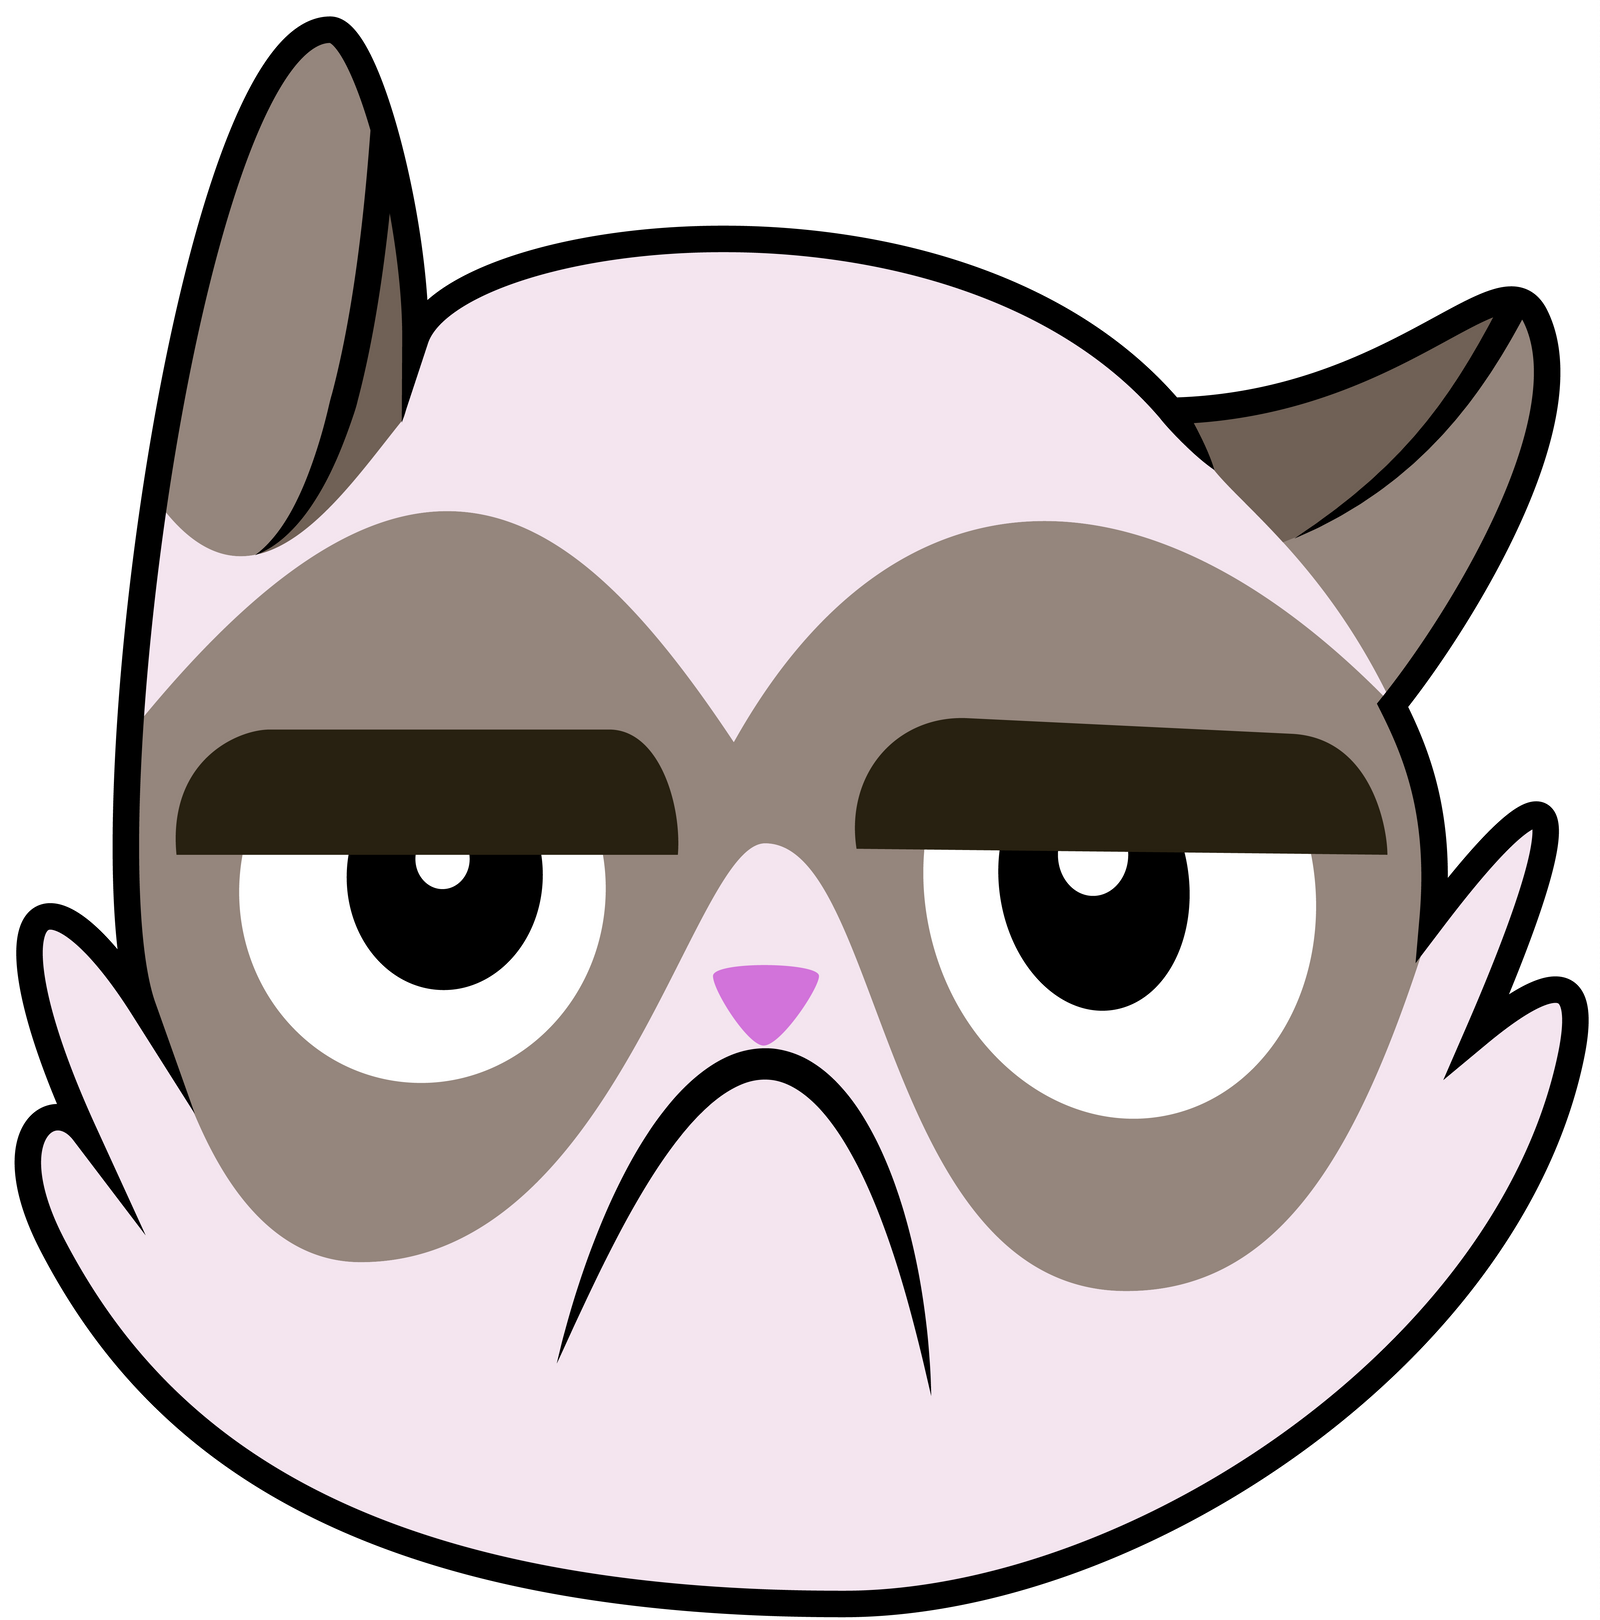 grumpy cat cutie mark canon by lahirien on deviantart